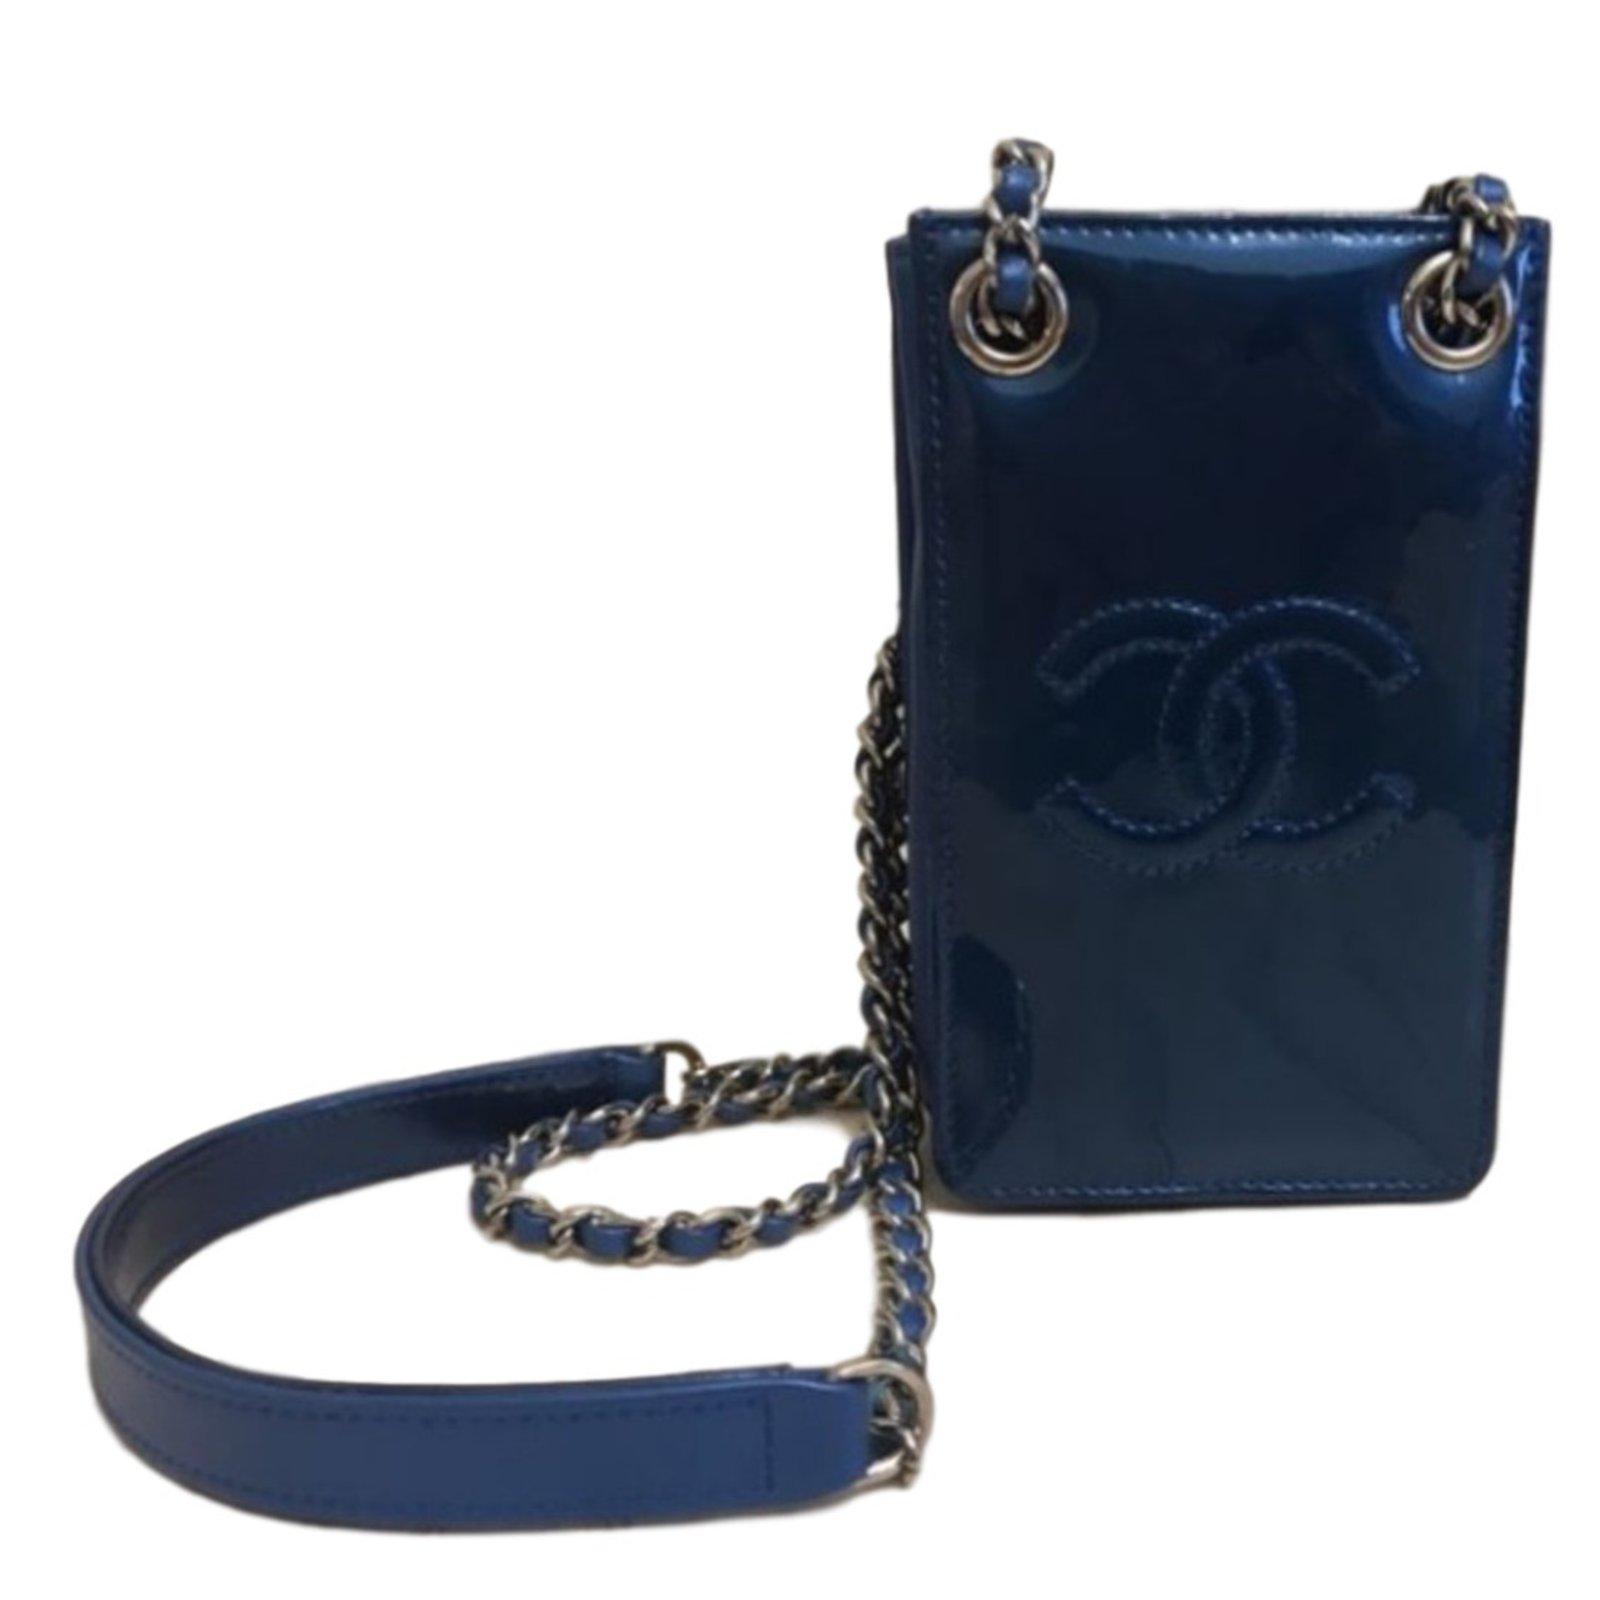 606df4a06d12 Chanel o-phone crossbody Handbags Patent leather Blue ref.38613 ...